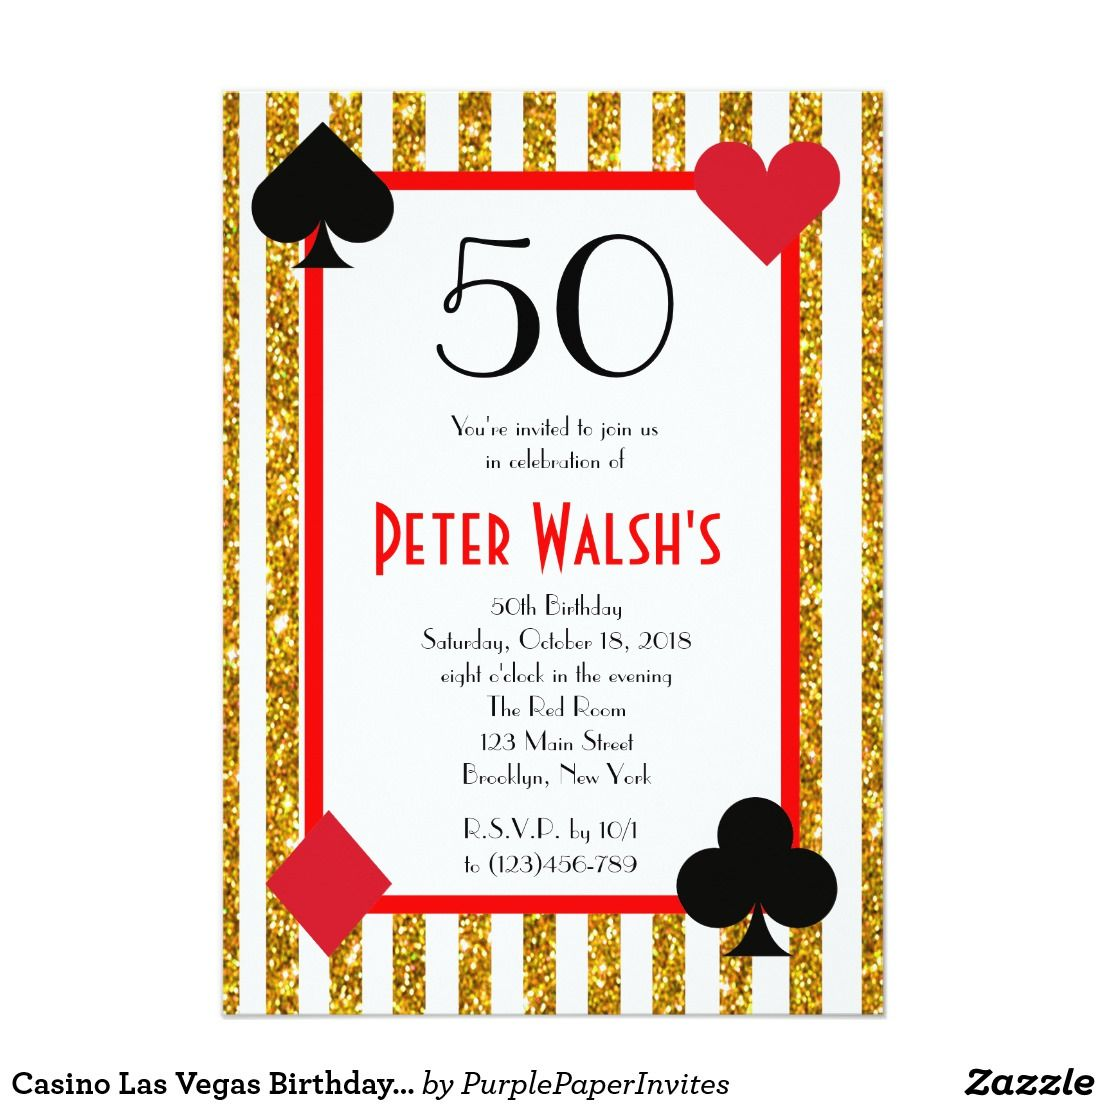 Casino Las Vegas Birthday Invitation   casino   Pinterest   Vegas ...